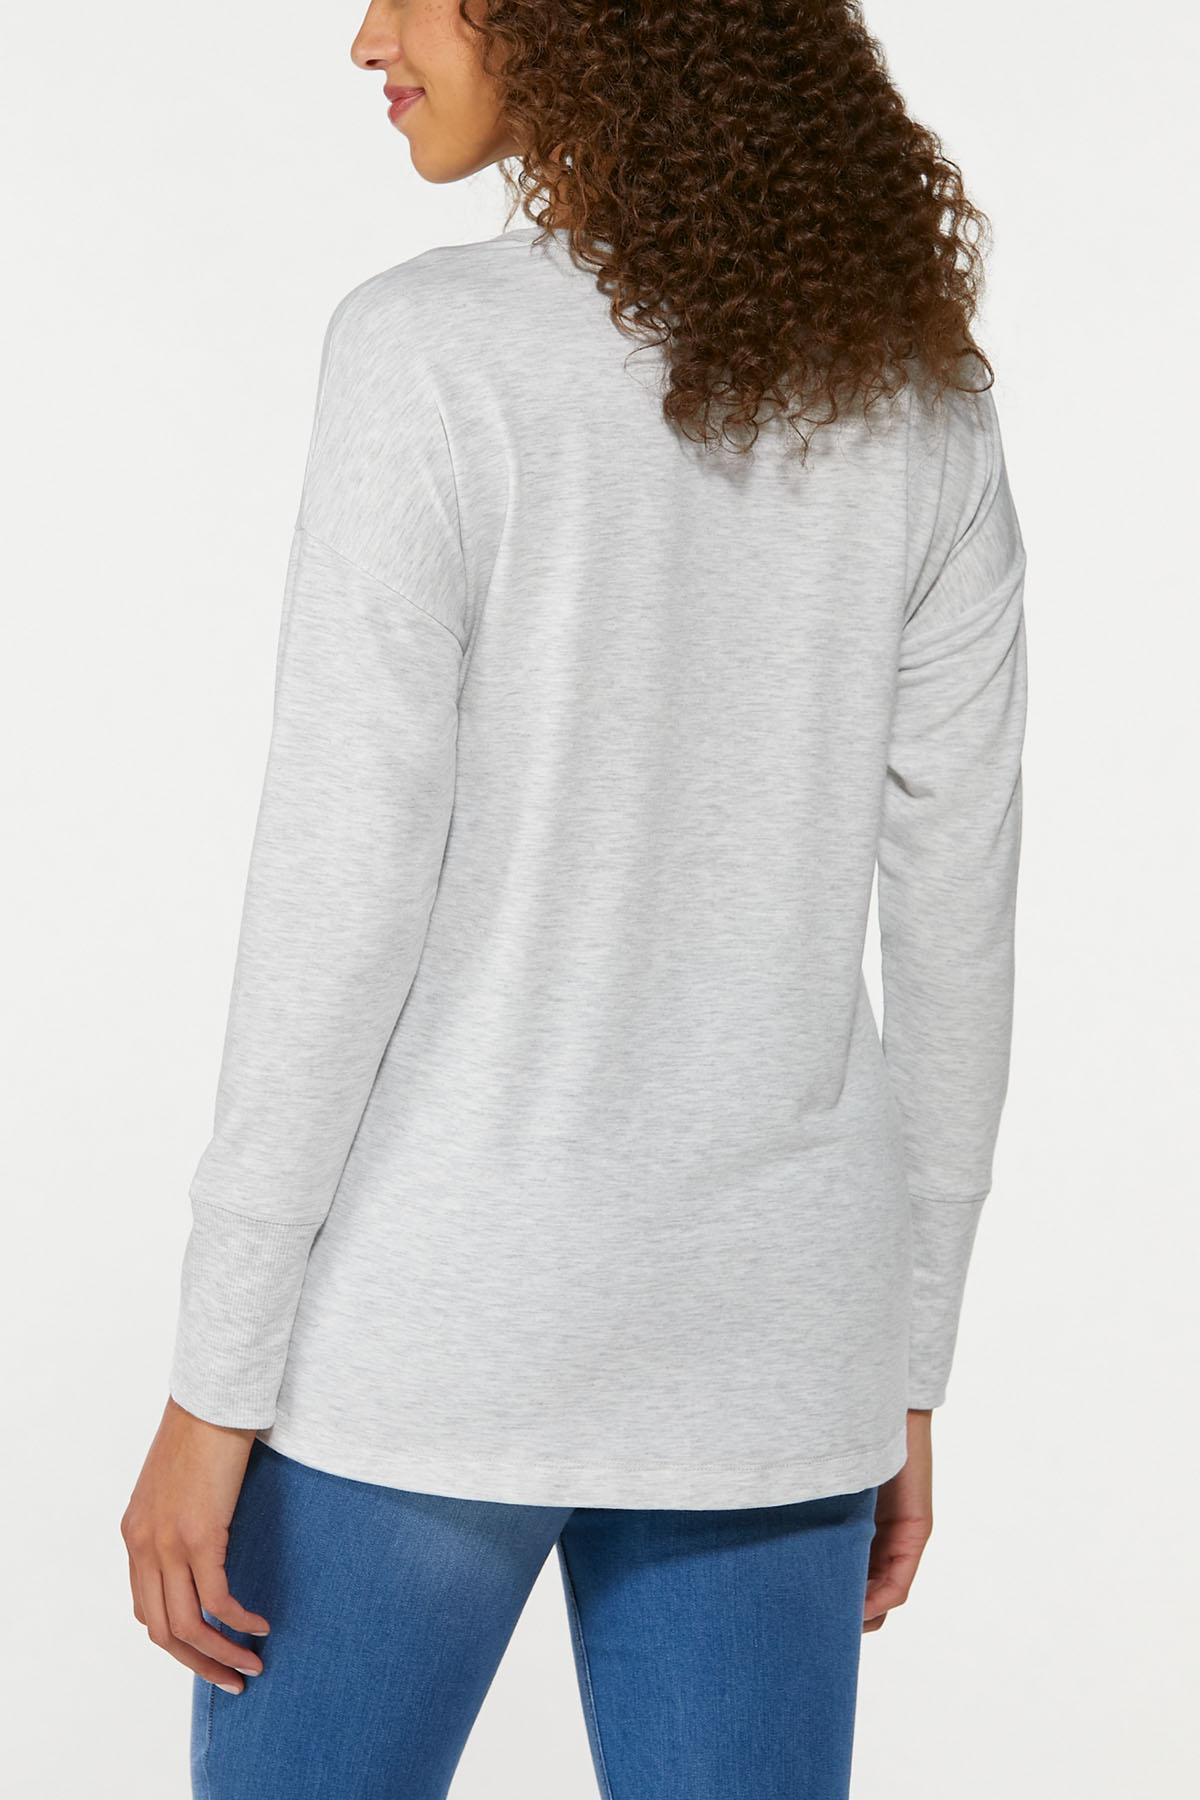 Plus Size Thankful Sweatshirt (Item #44744489)